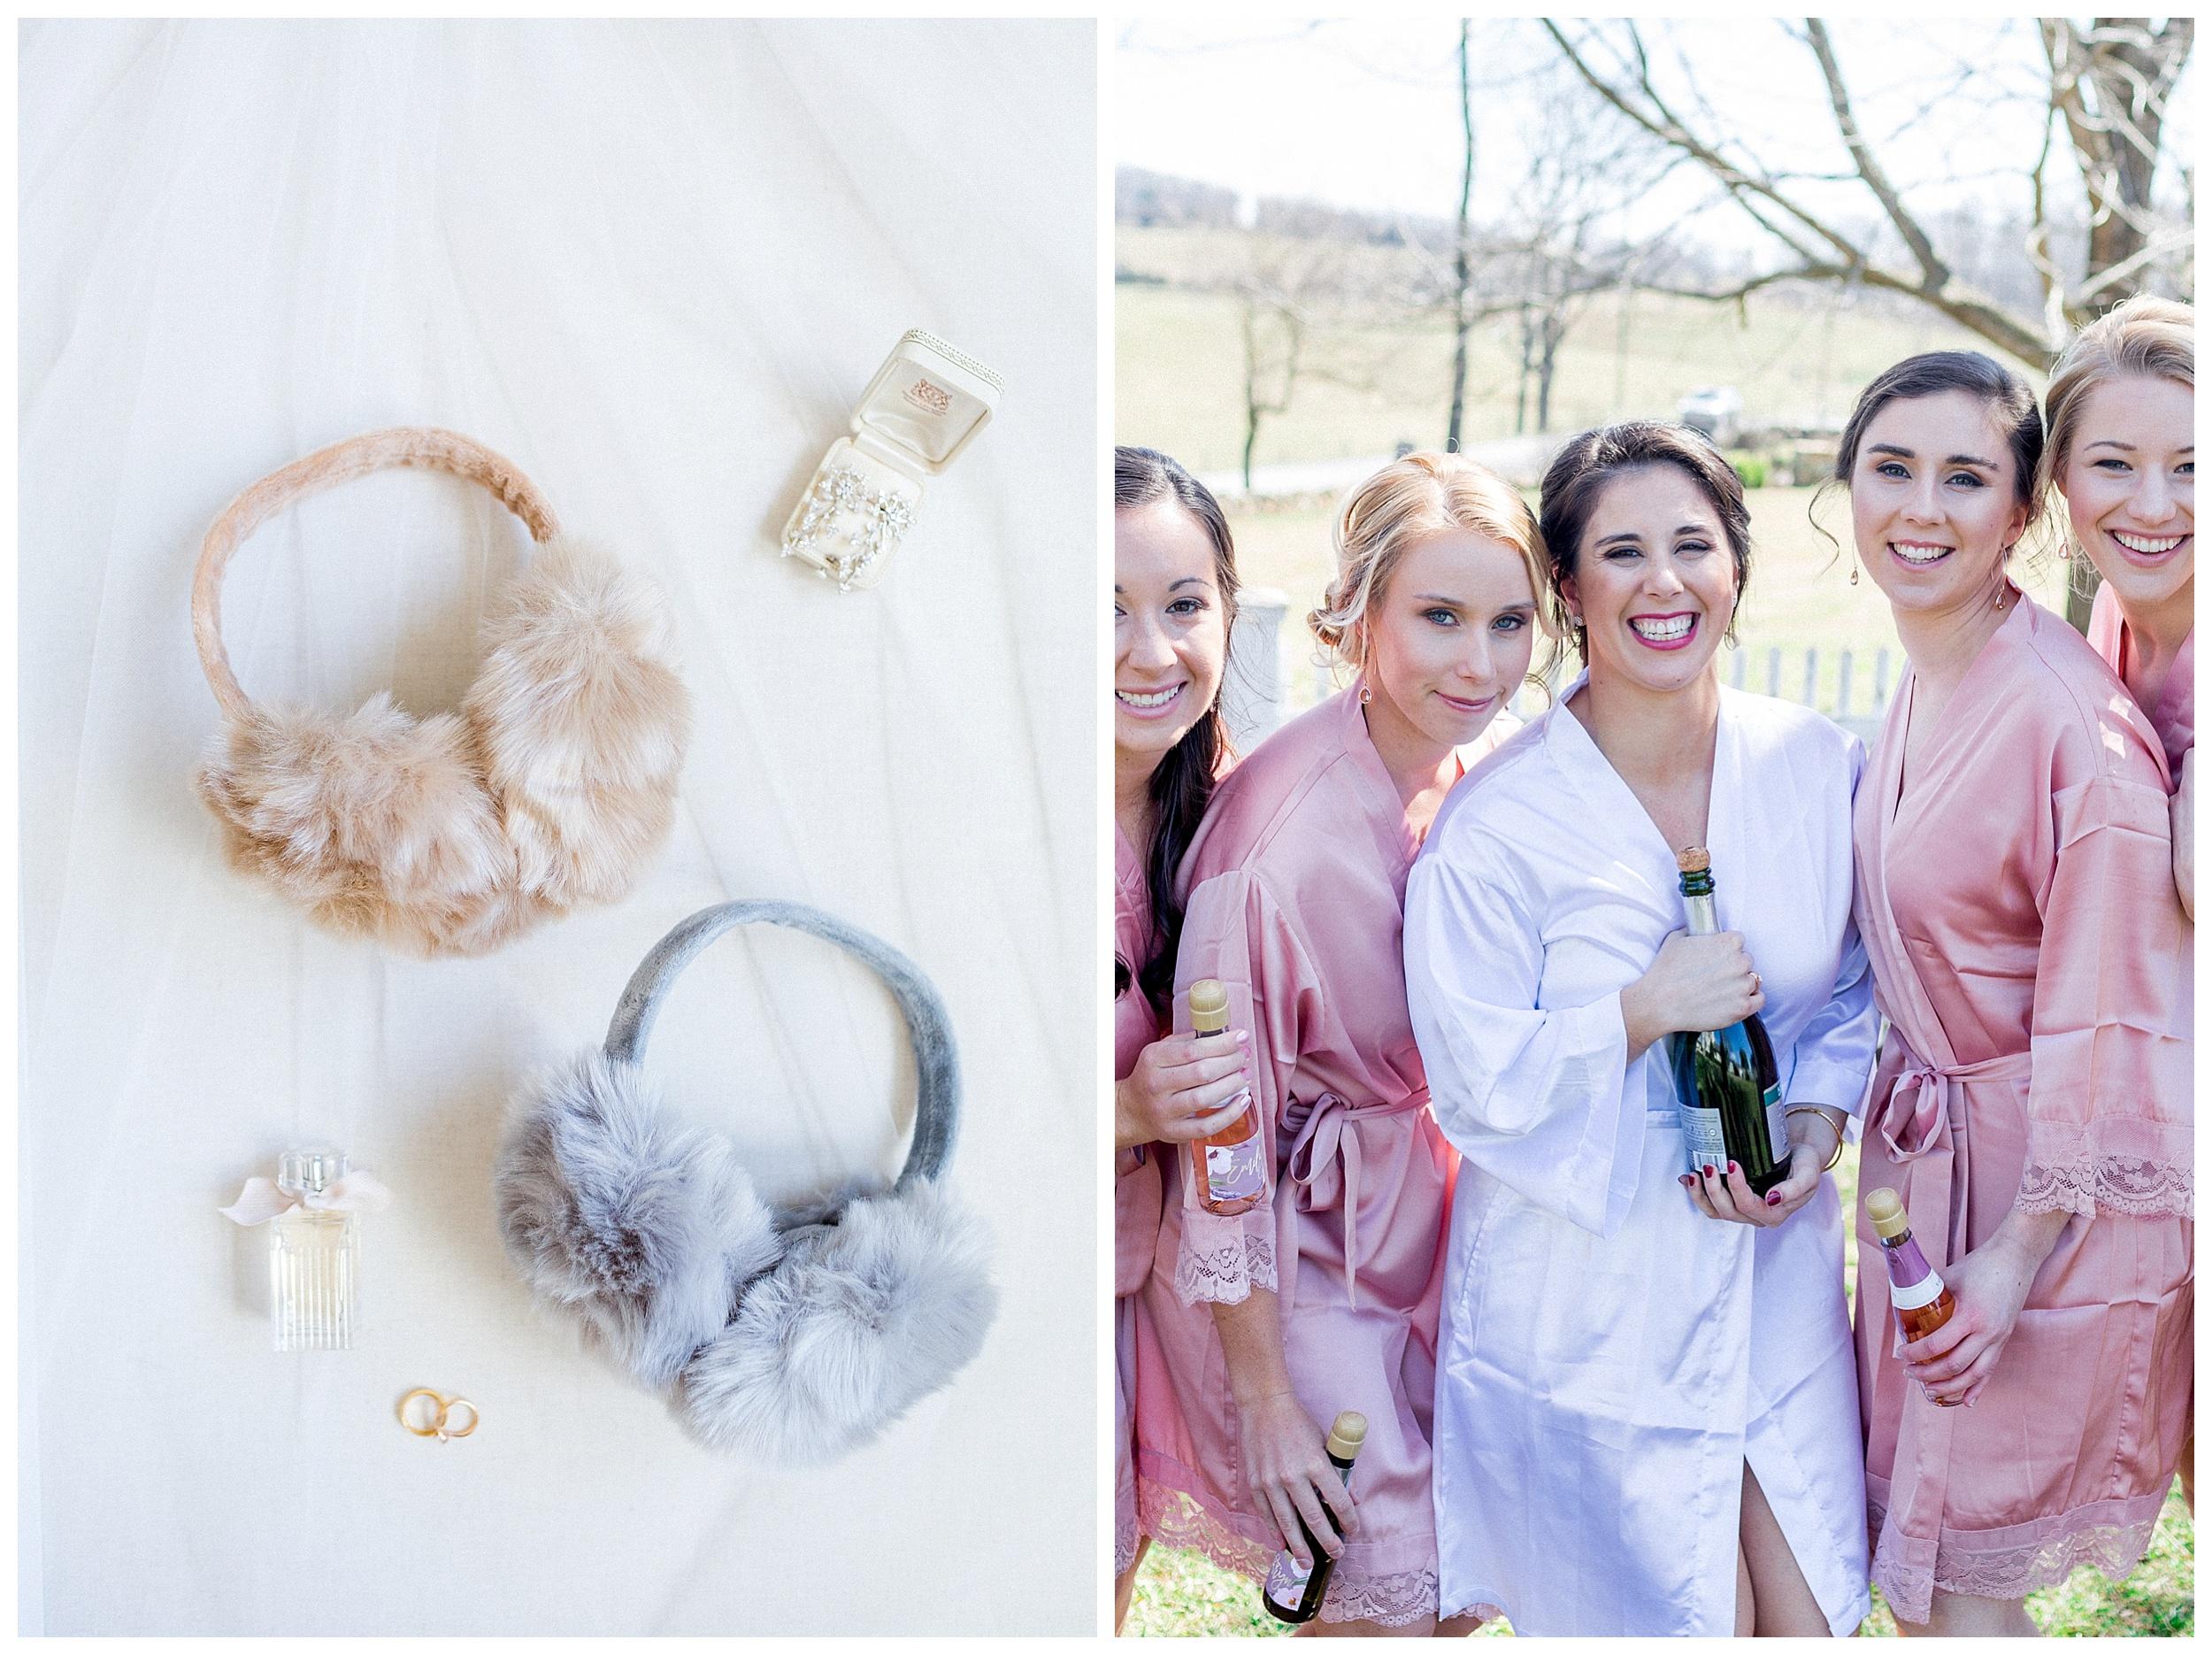 Stone Tower Winery Wedding | Virginia Winter Wedding | VA Wedding Photographer Kir Tuben_0010.jpg